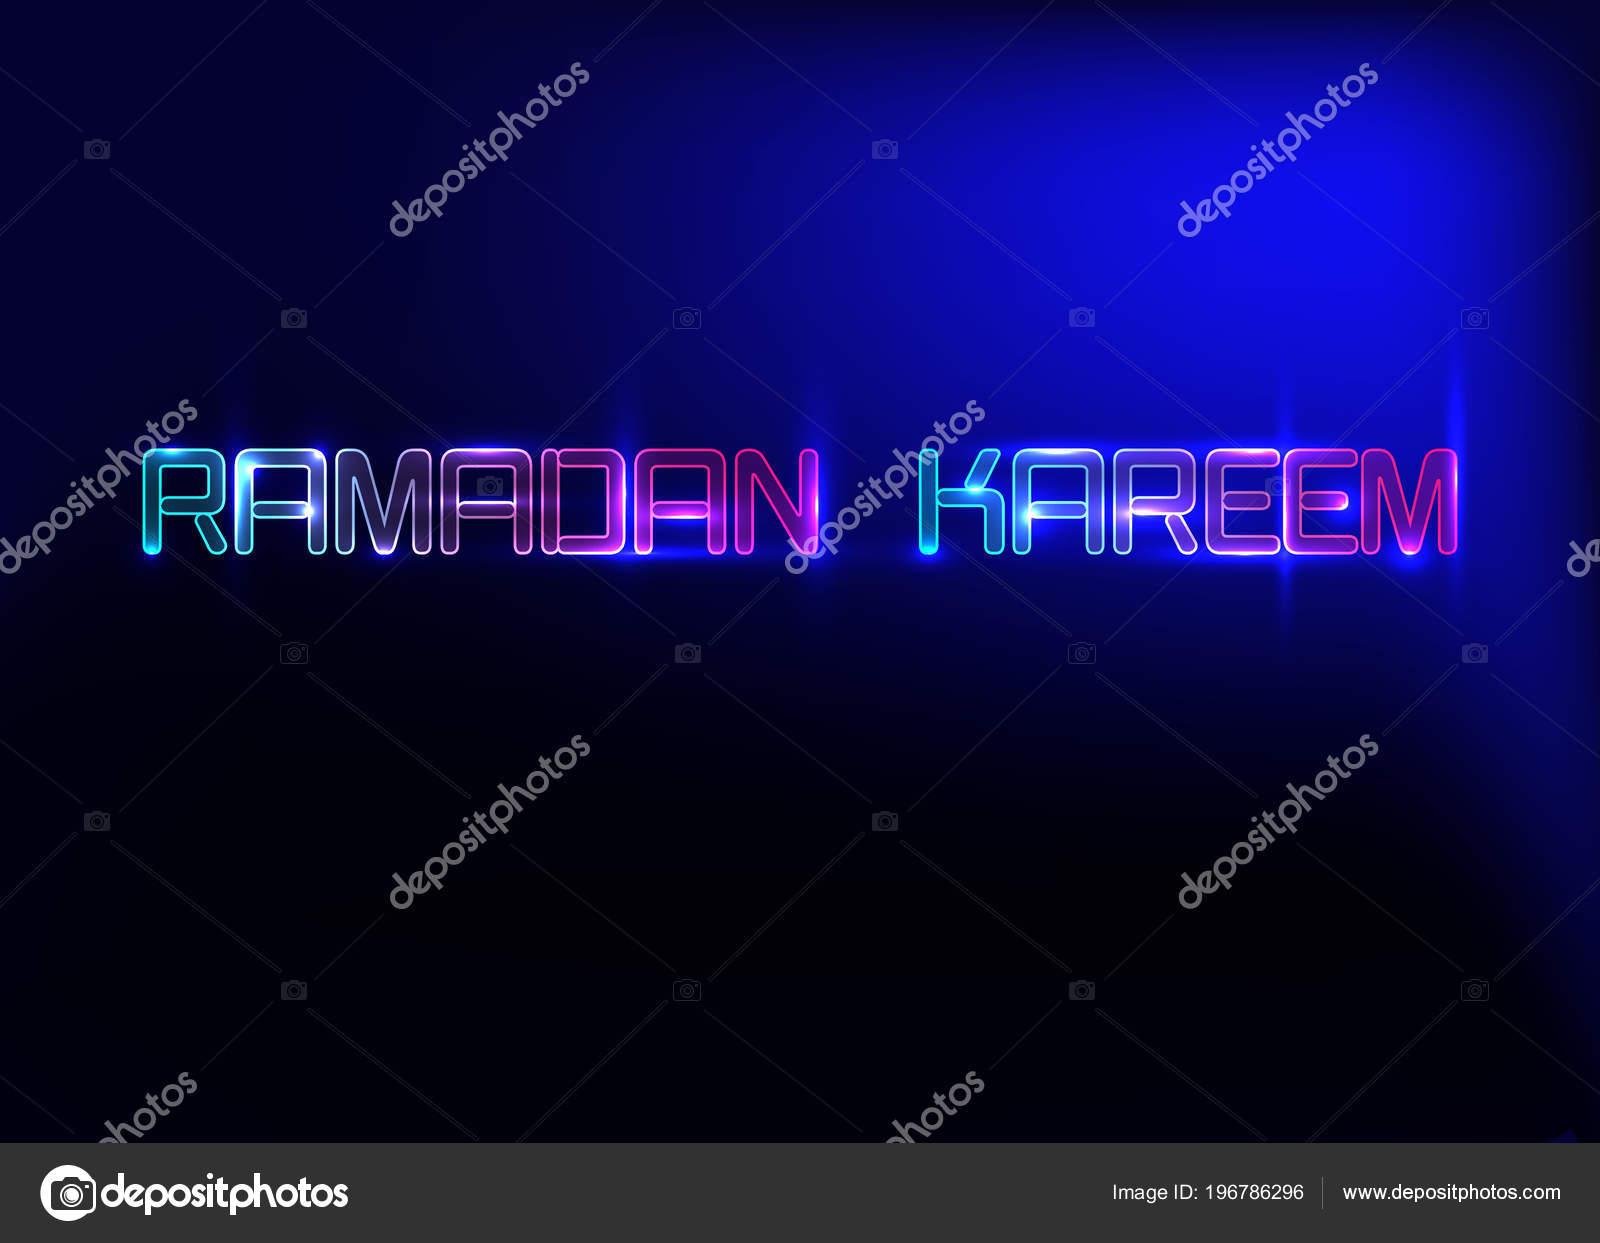 Ramadan kareem greeting cards neon sign design template light banner ramadan kareem greeting cards neon sign design template light banner night neon advert ramadan kareem glorious month of muslim year m4hsunfo